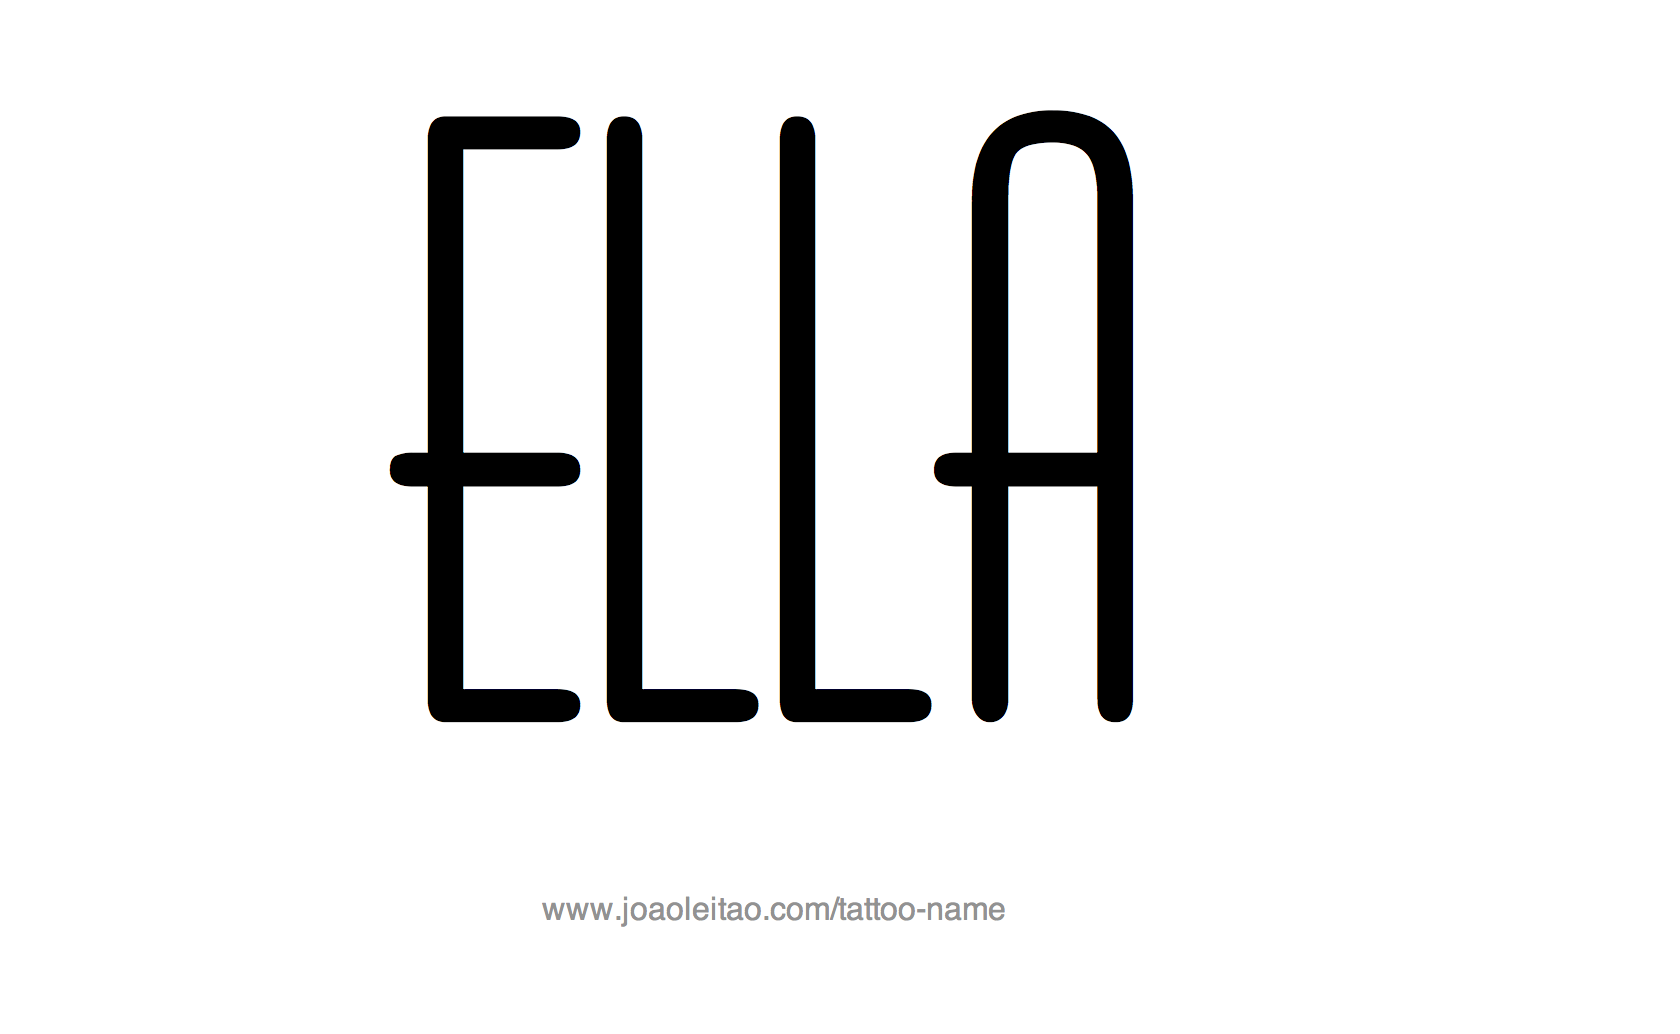 Name tattoo designs free - Tattoo Design Name Ella